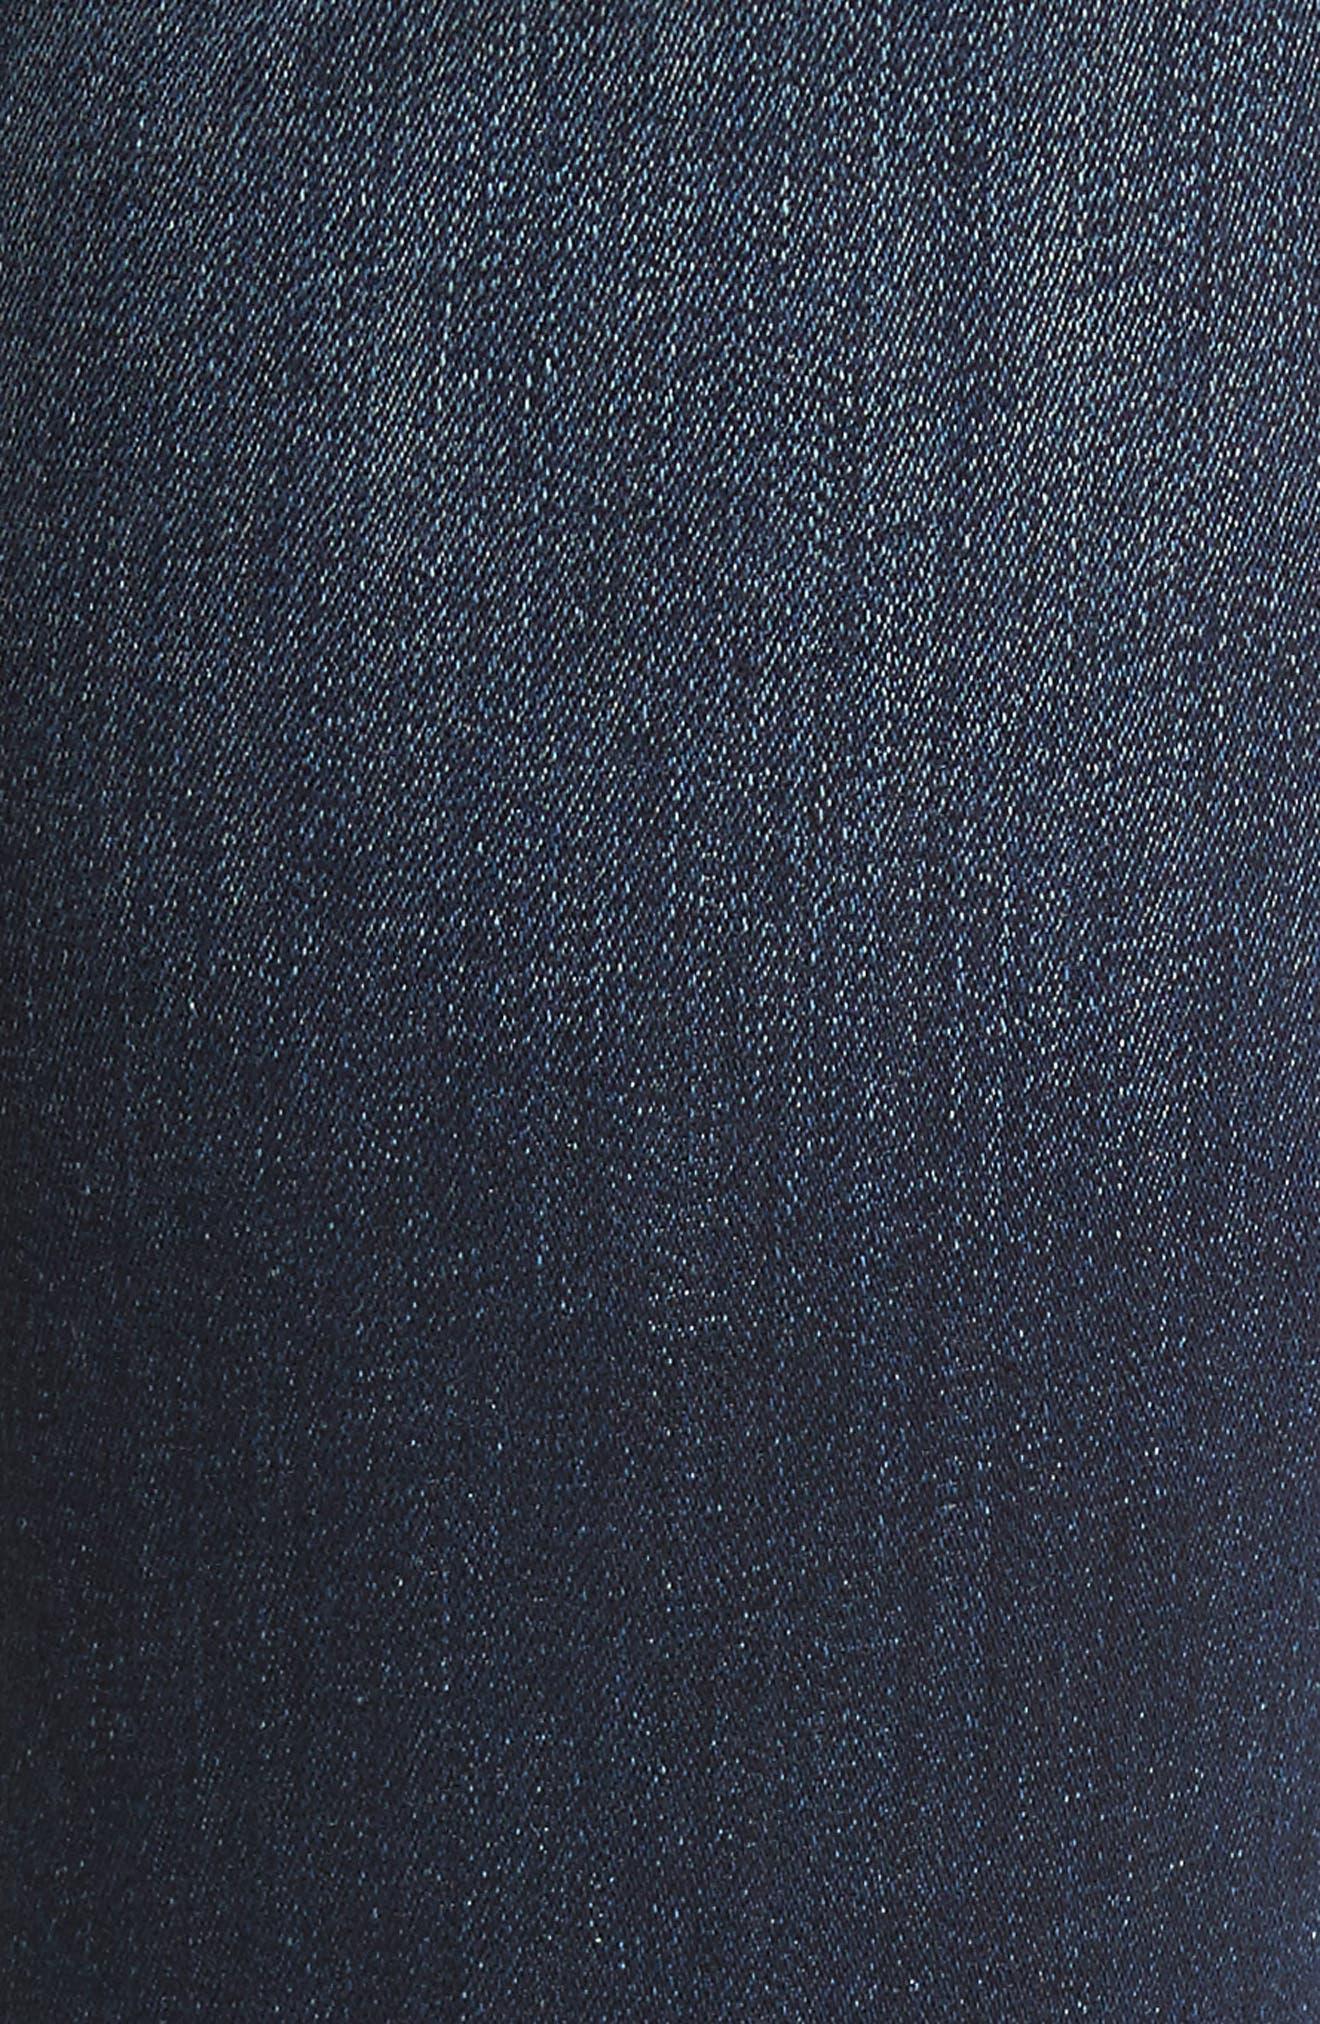 Emma Power Legging Skinny Jeans,                             Alternate thumbnail 6, color,                             Sulton